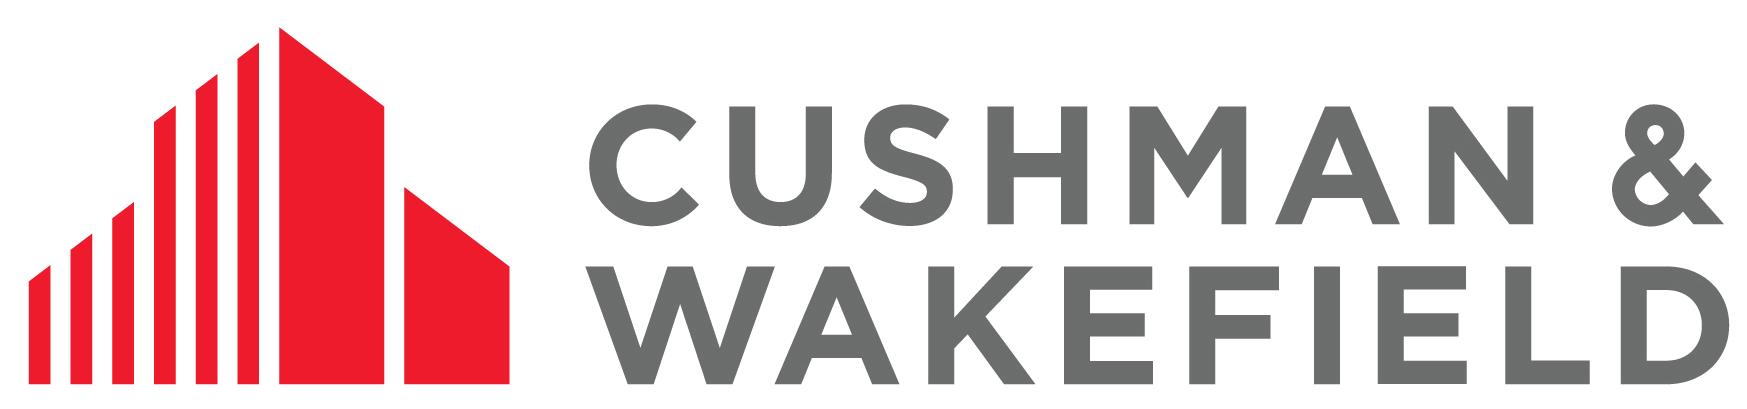 Cushman & Wakefield 2 copy